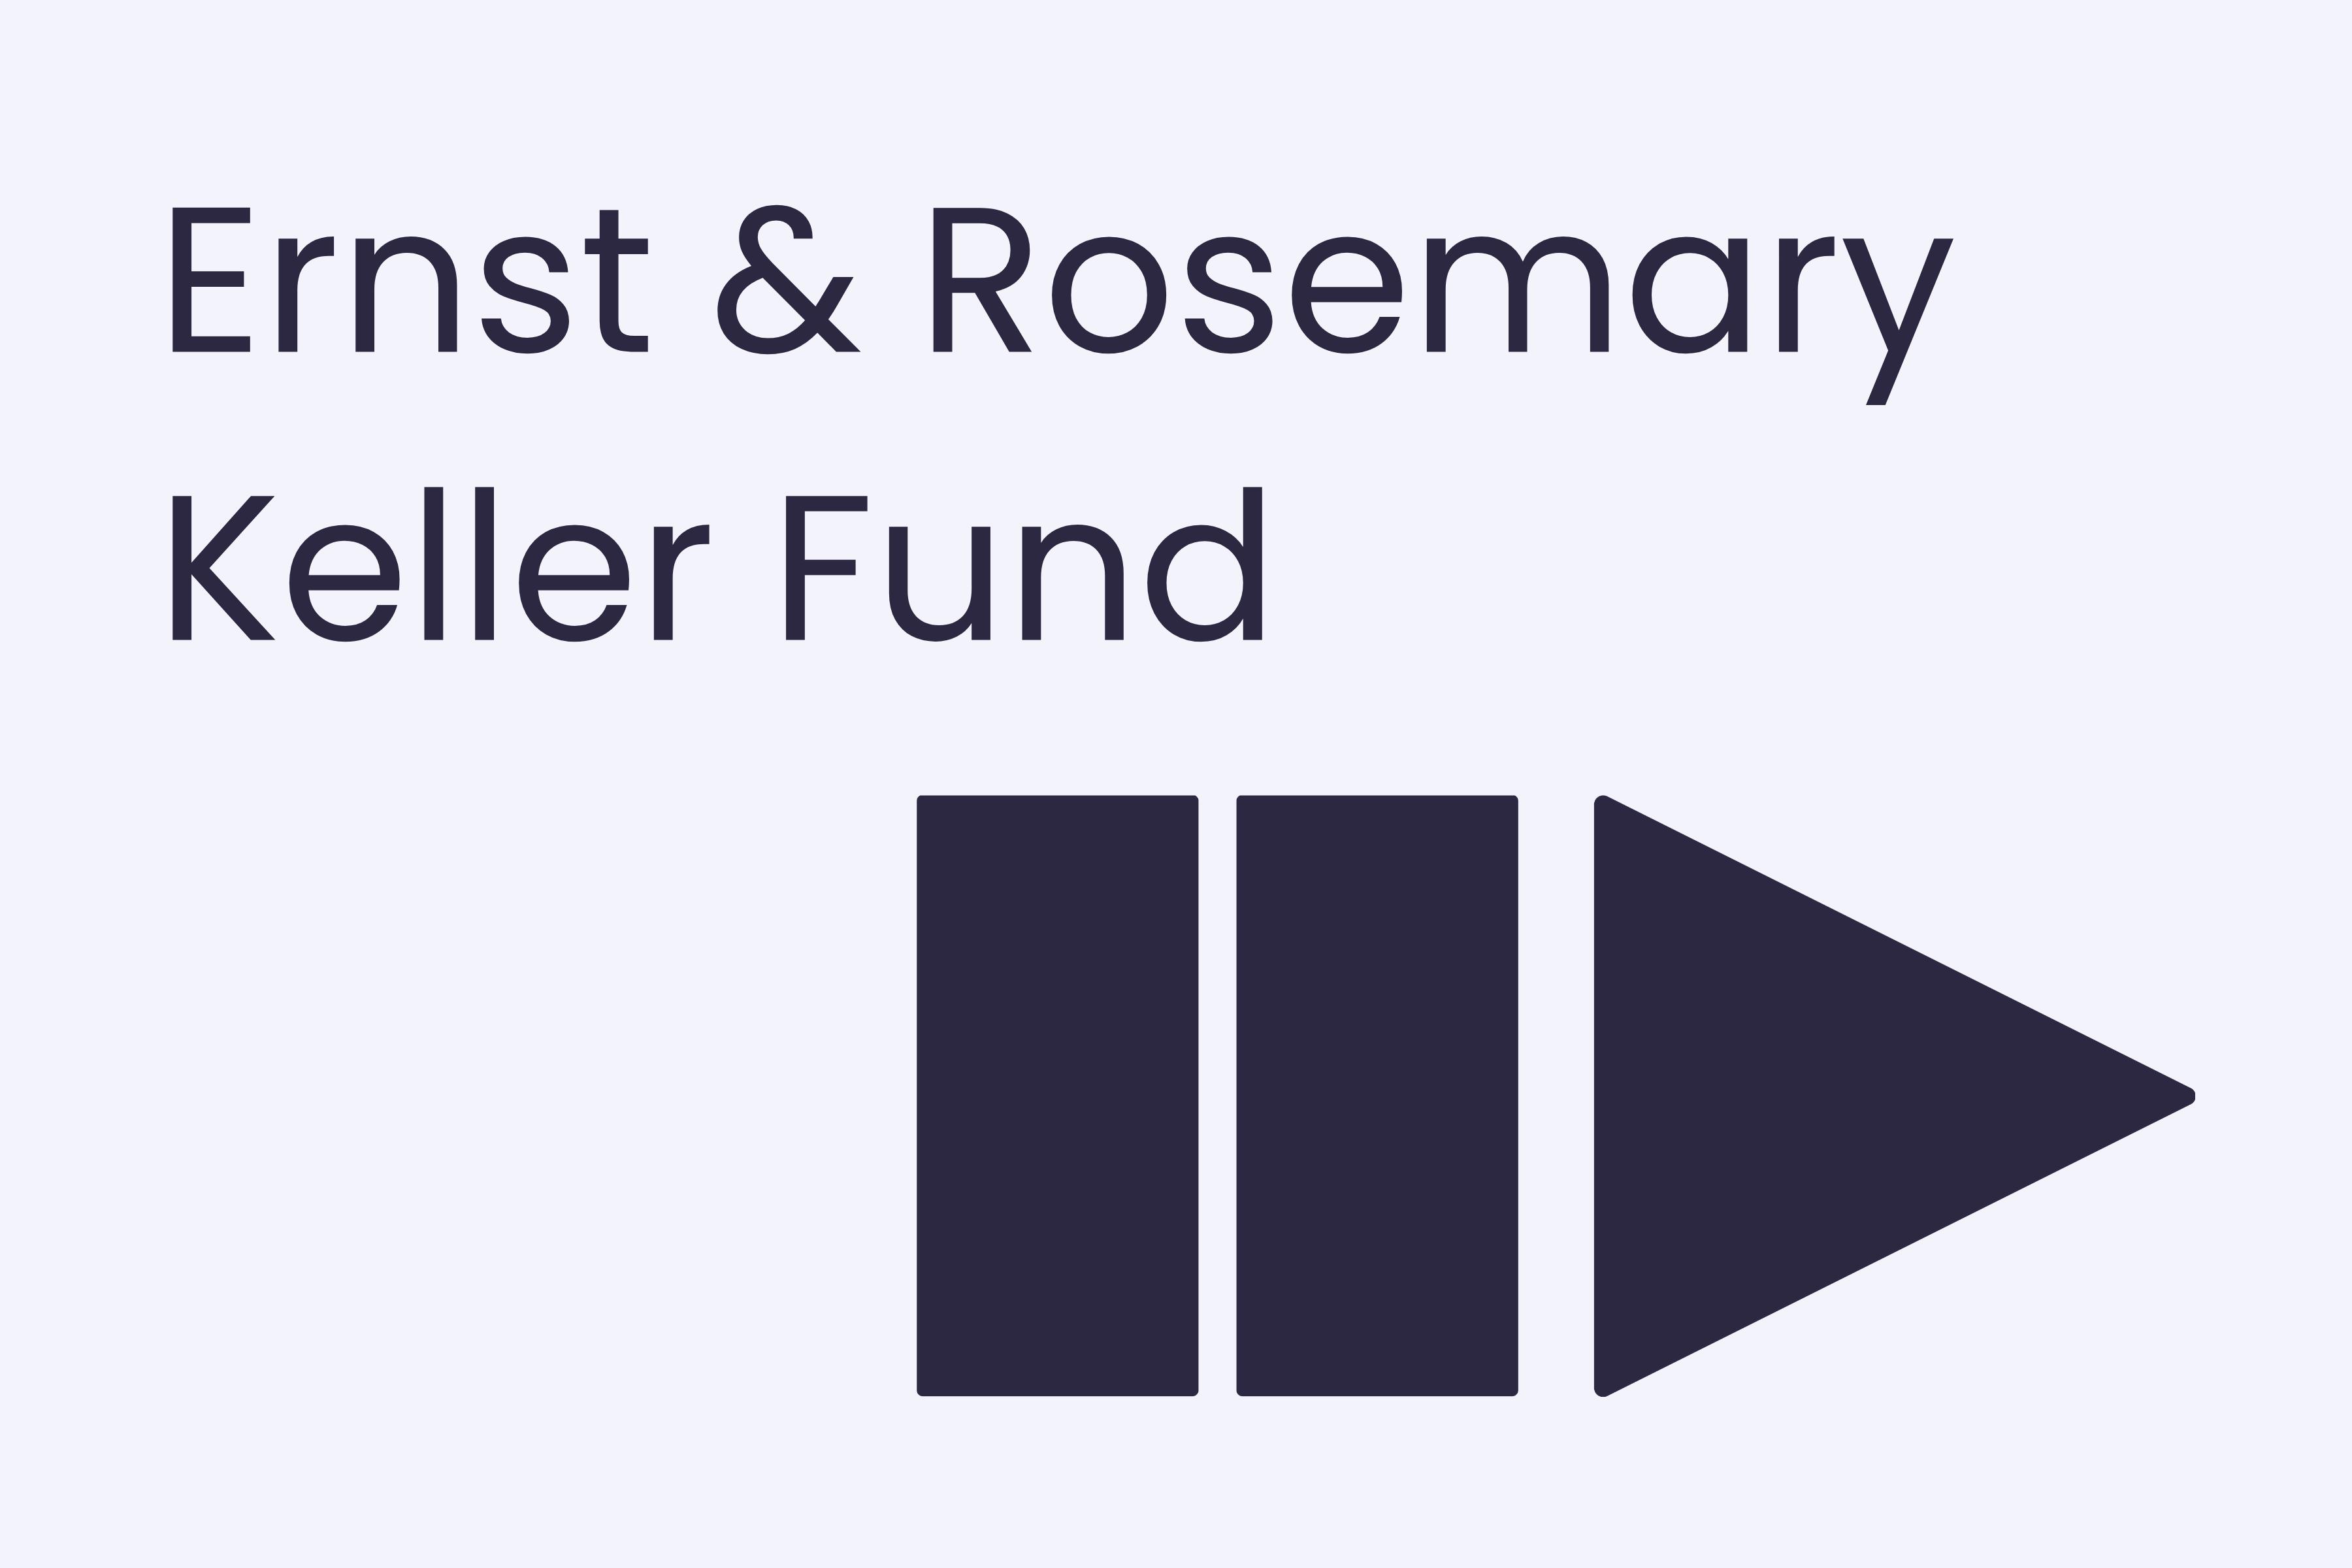 Ernst and Rosemary Keller Fund